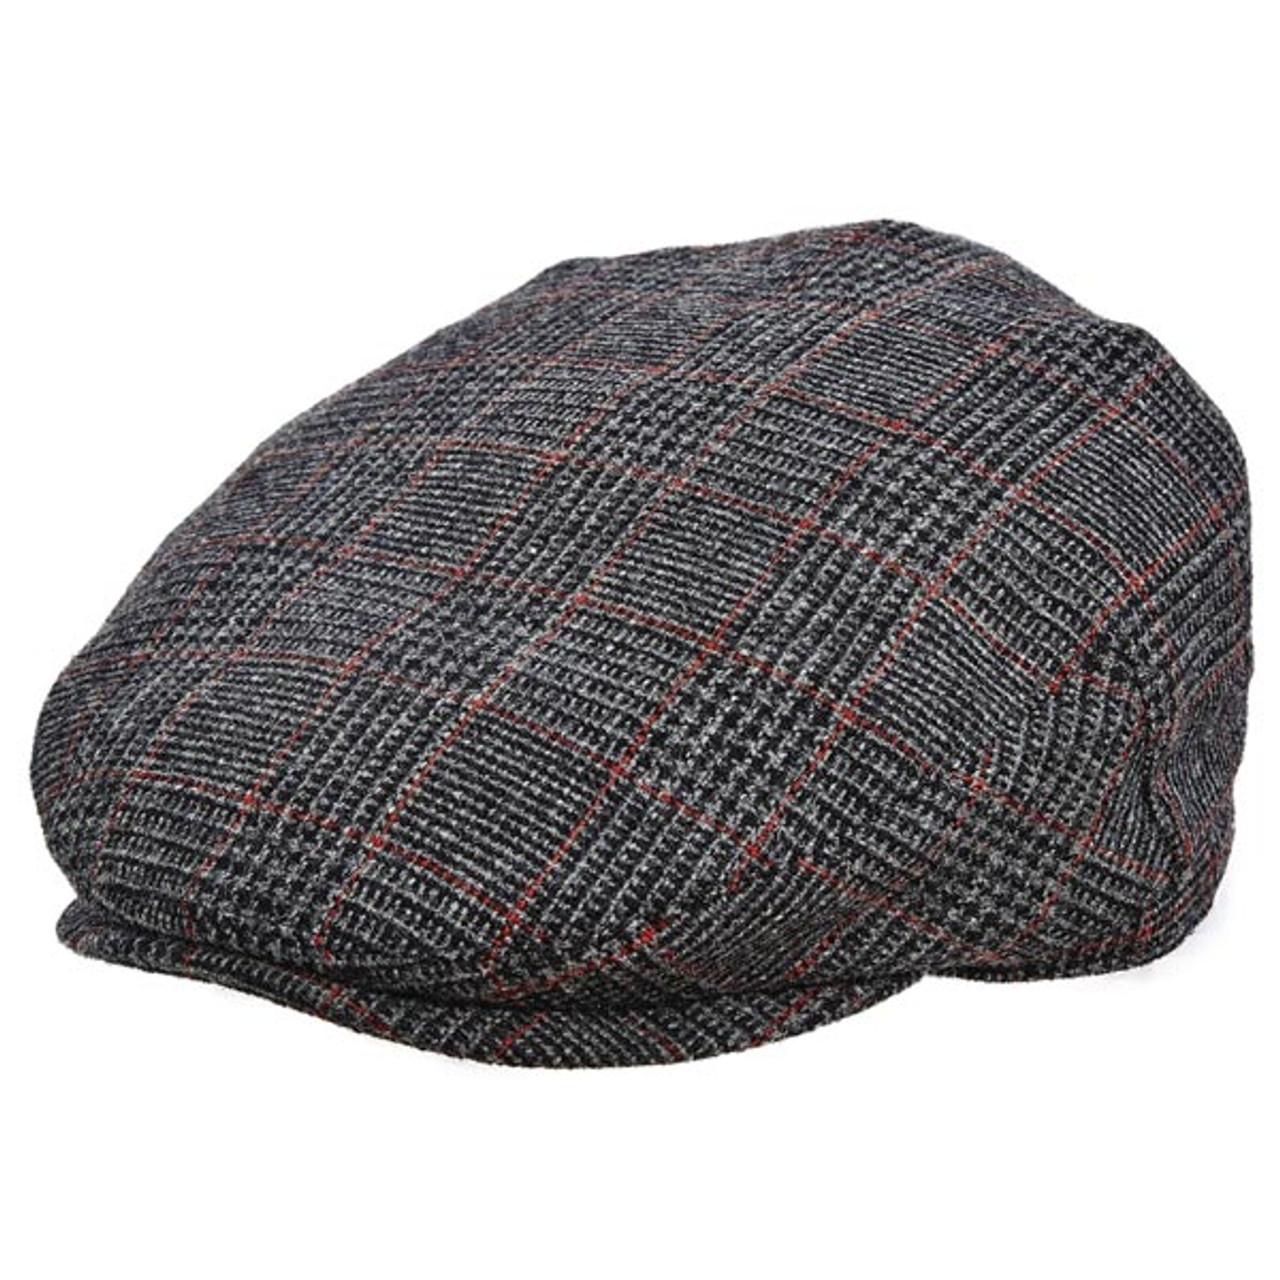 5ce9e70510f2f Previous. Stetson - Plaid Italian Wool ...